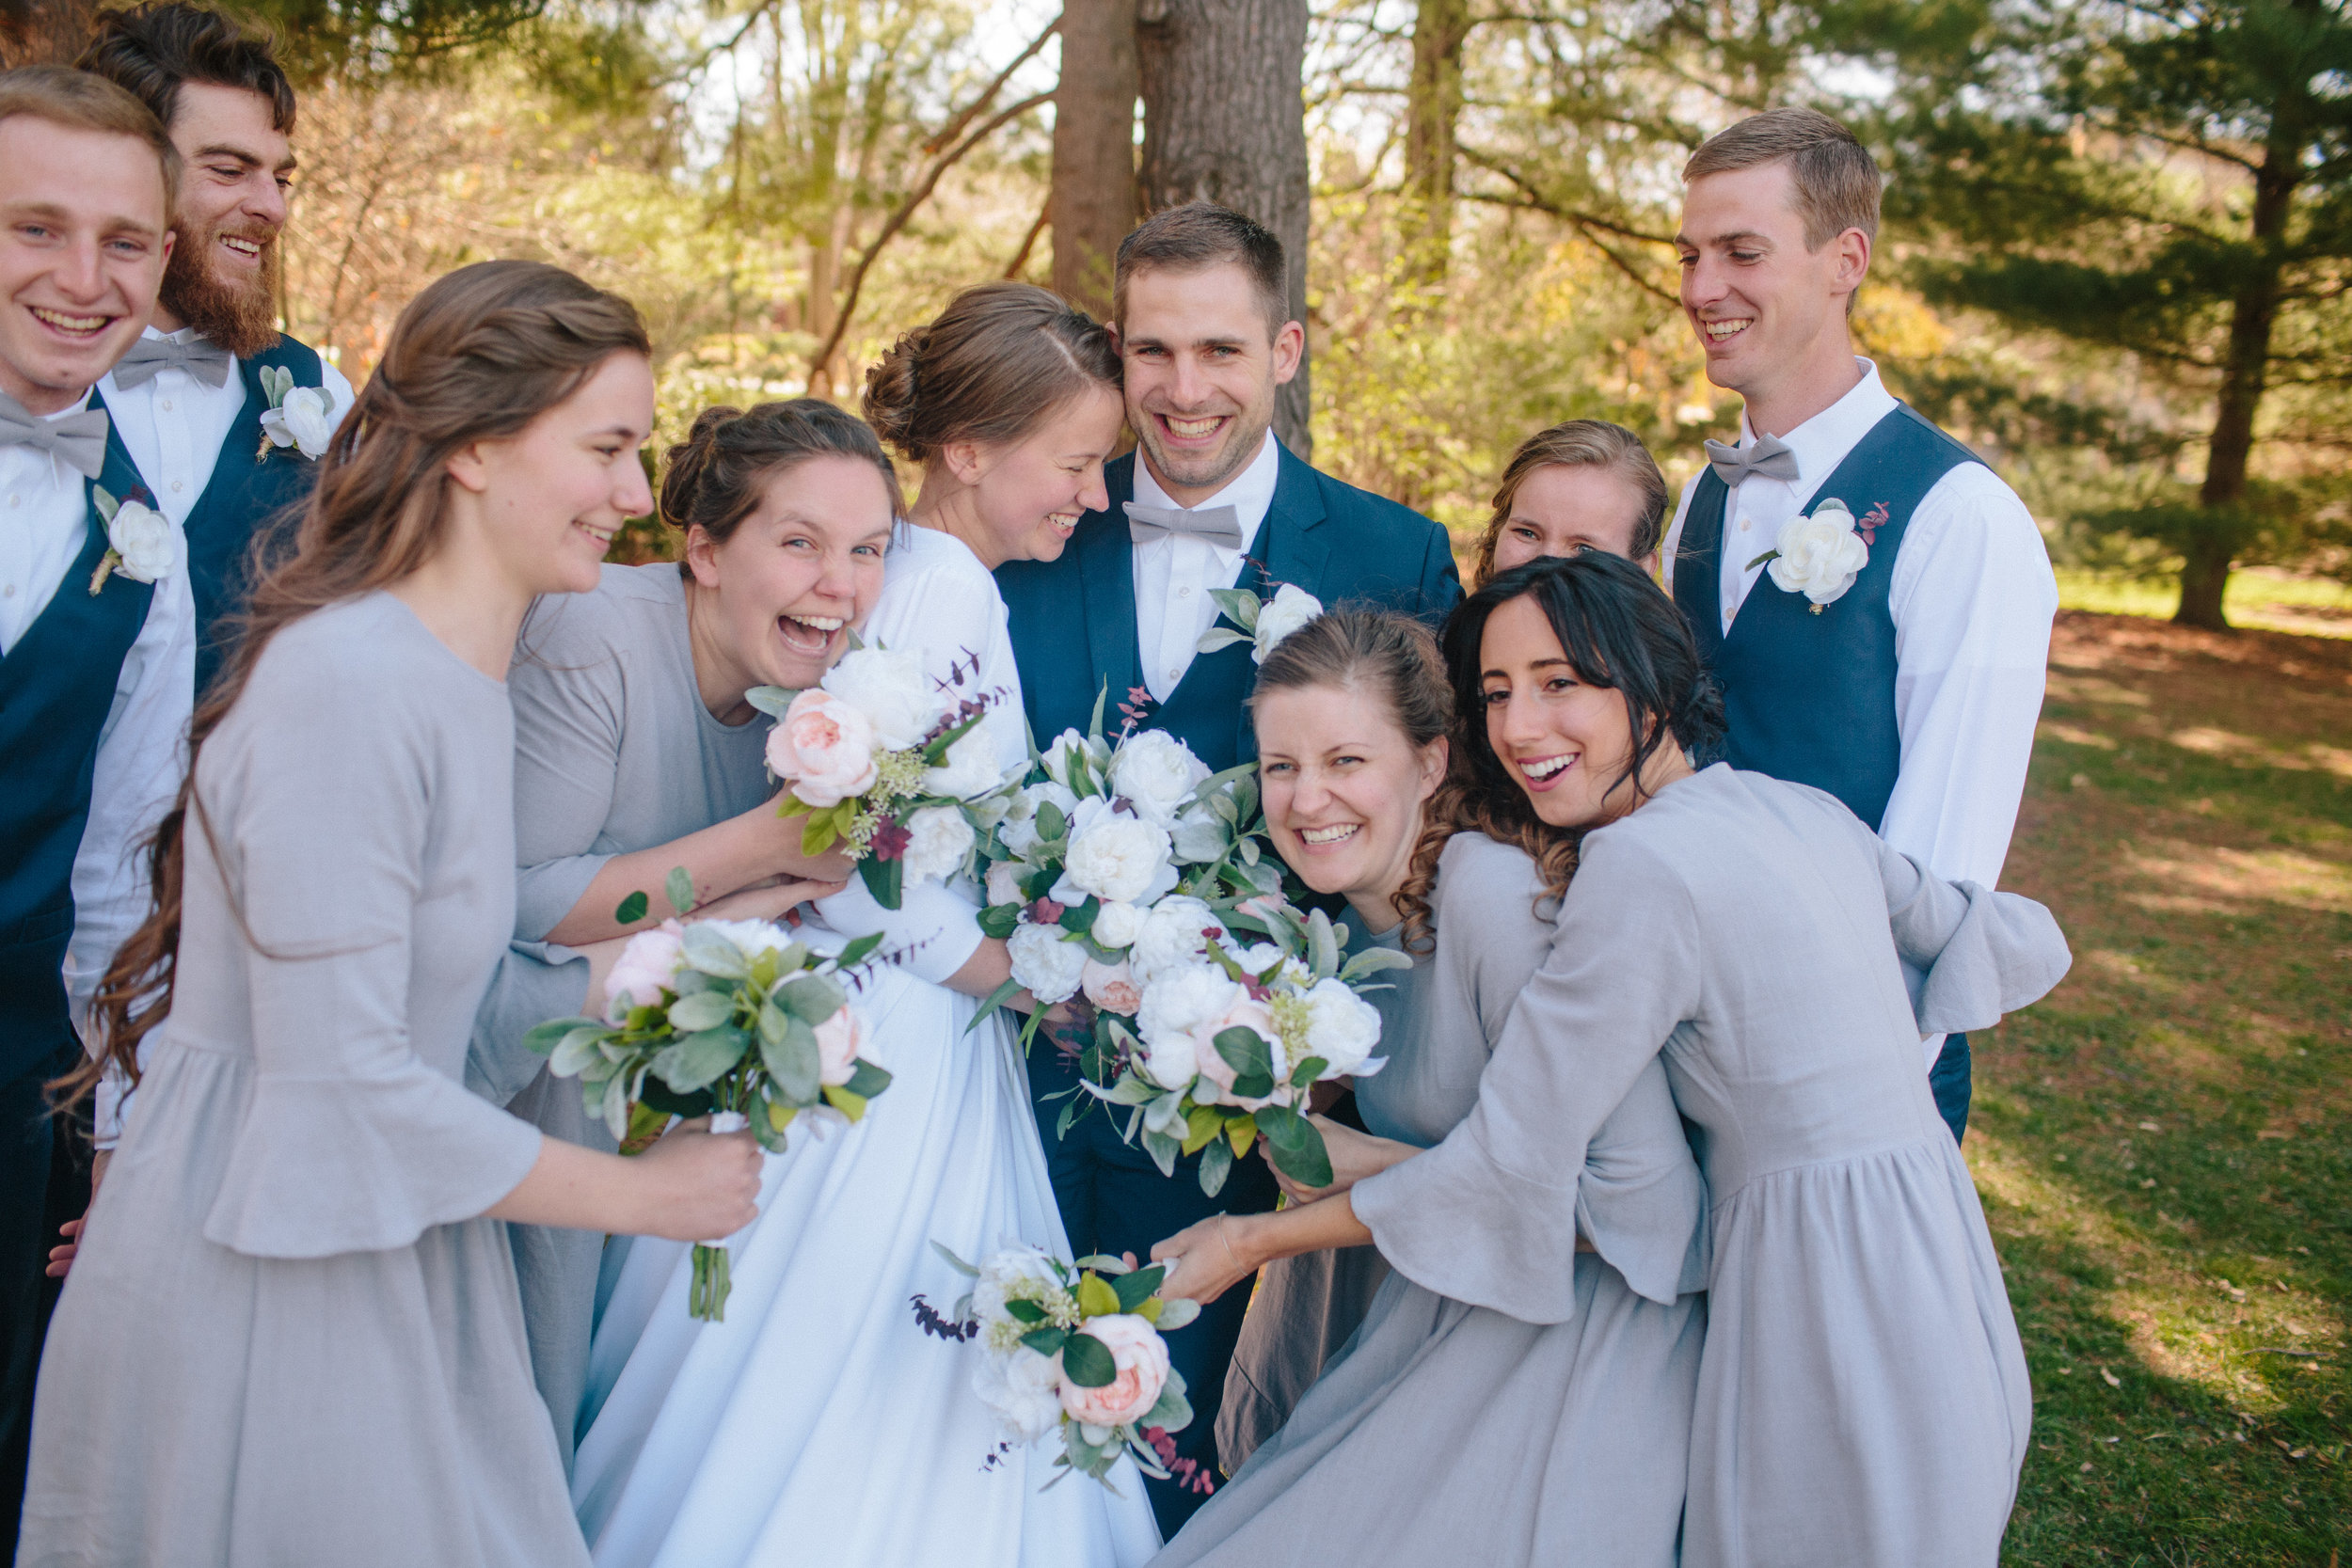 des moines wedding and senior photographer